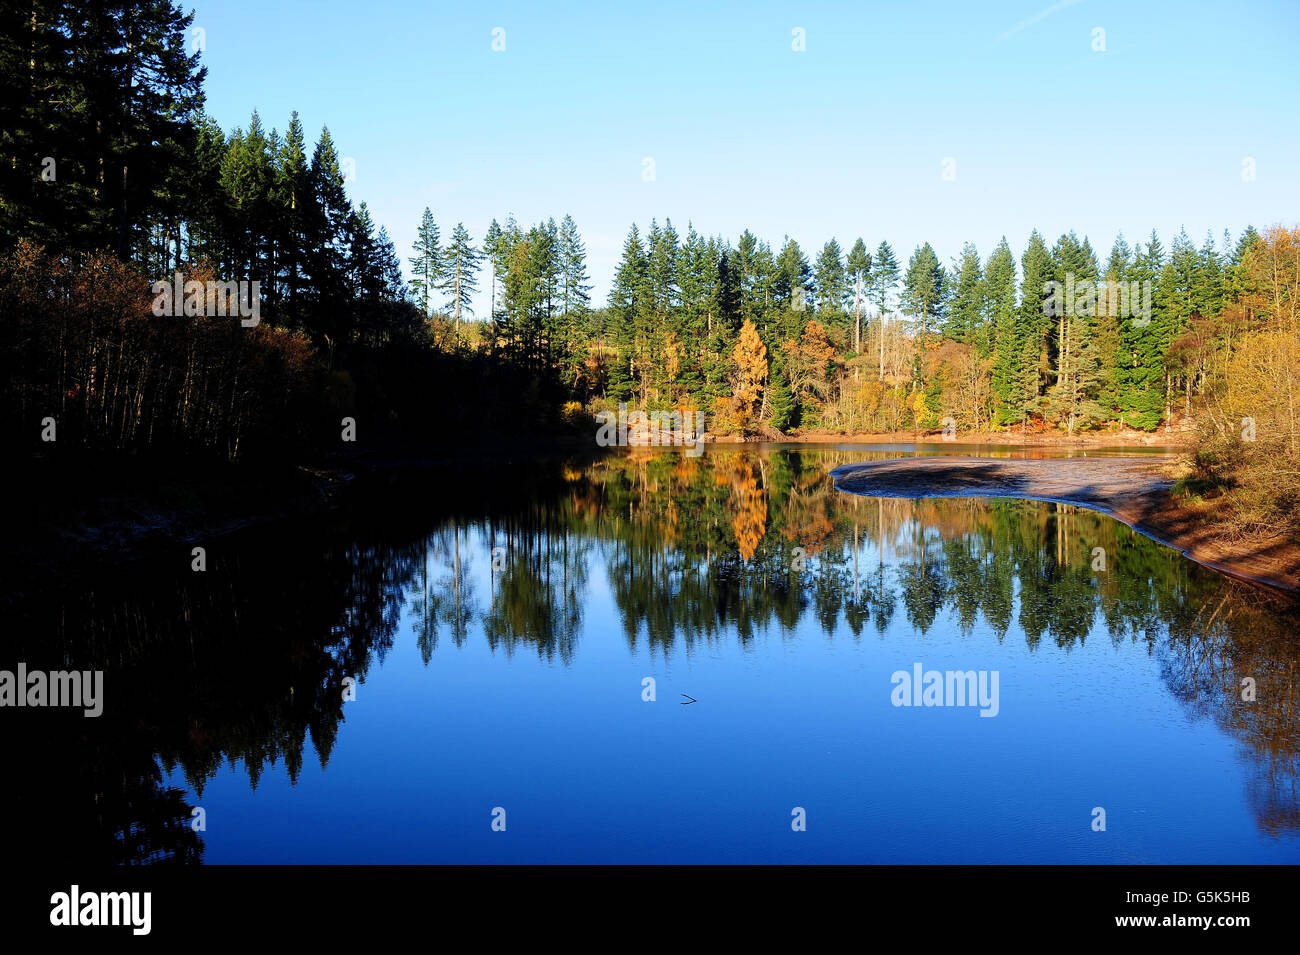 Autumn weather Nov 5 - Stock Image